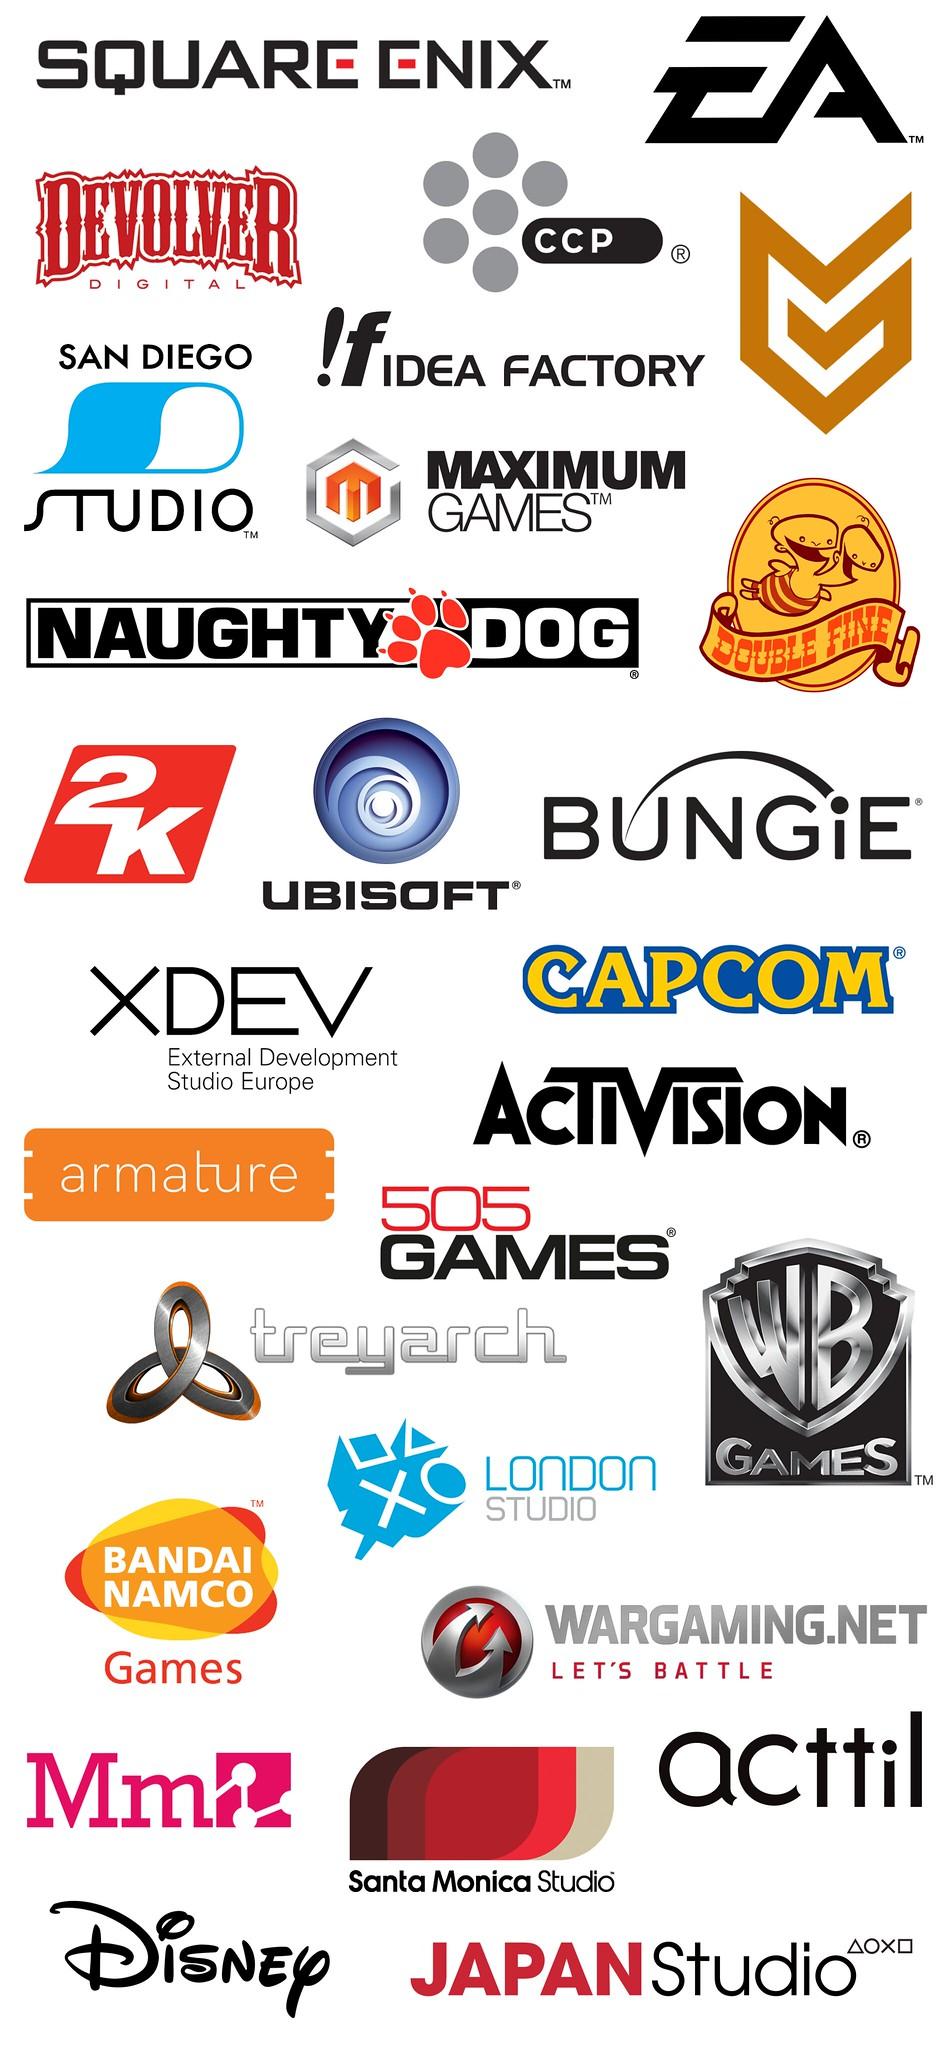 PlayStation Experience 2015 v2